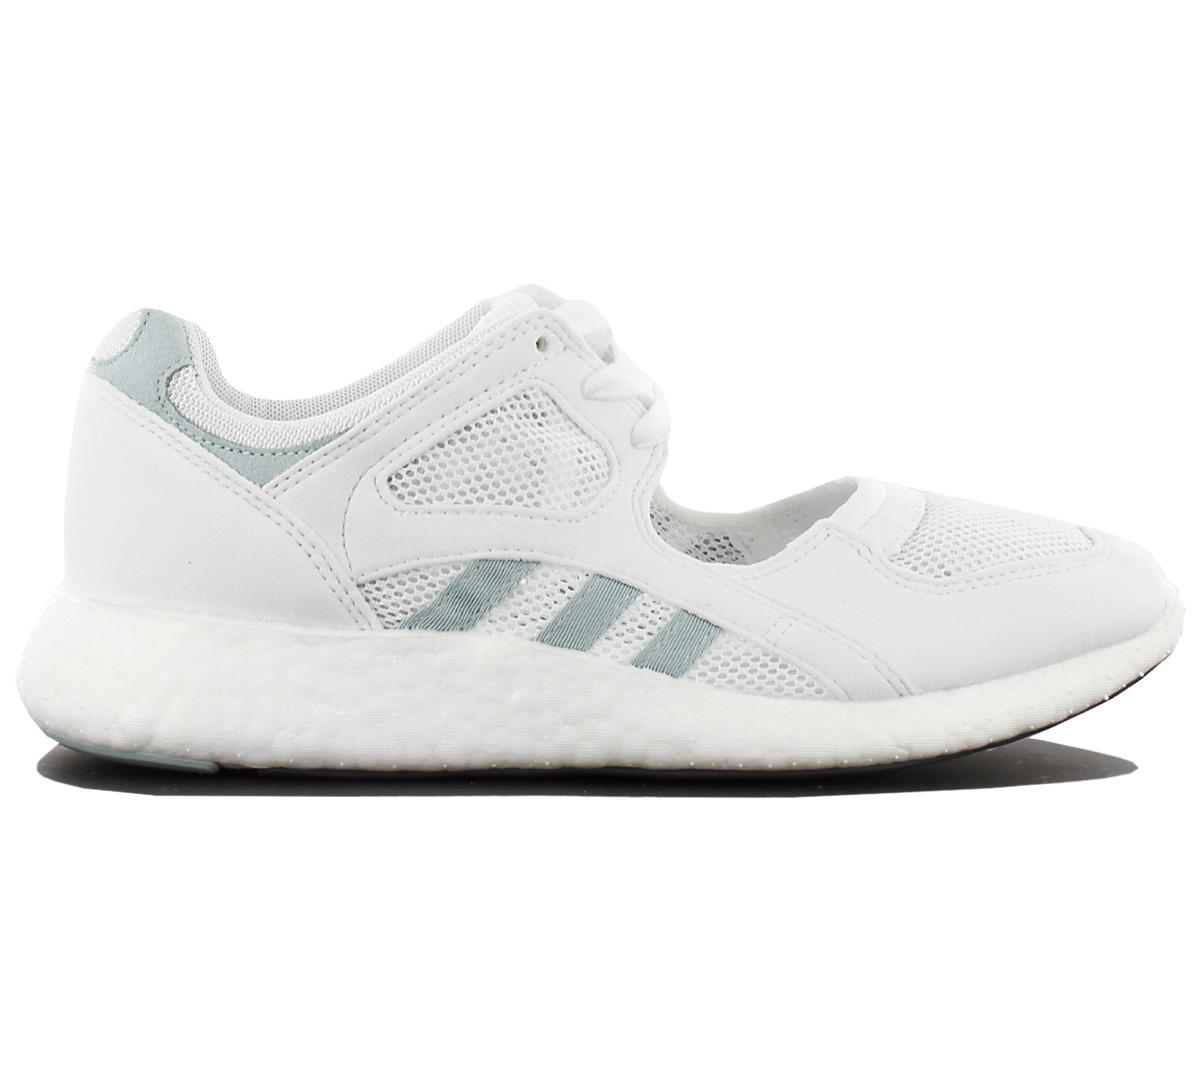 new products 29646 cd388 Details about Adidas Originals Eqt Equipment Racing 91/16 Women's Sneaker  Shoes Sandals BA7570